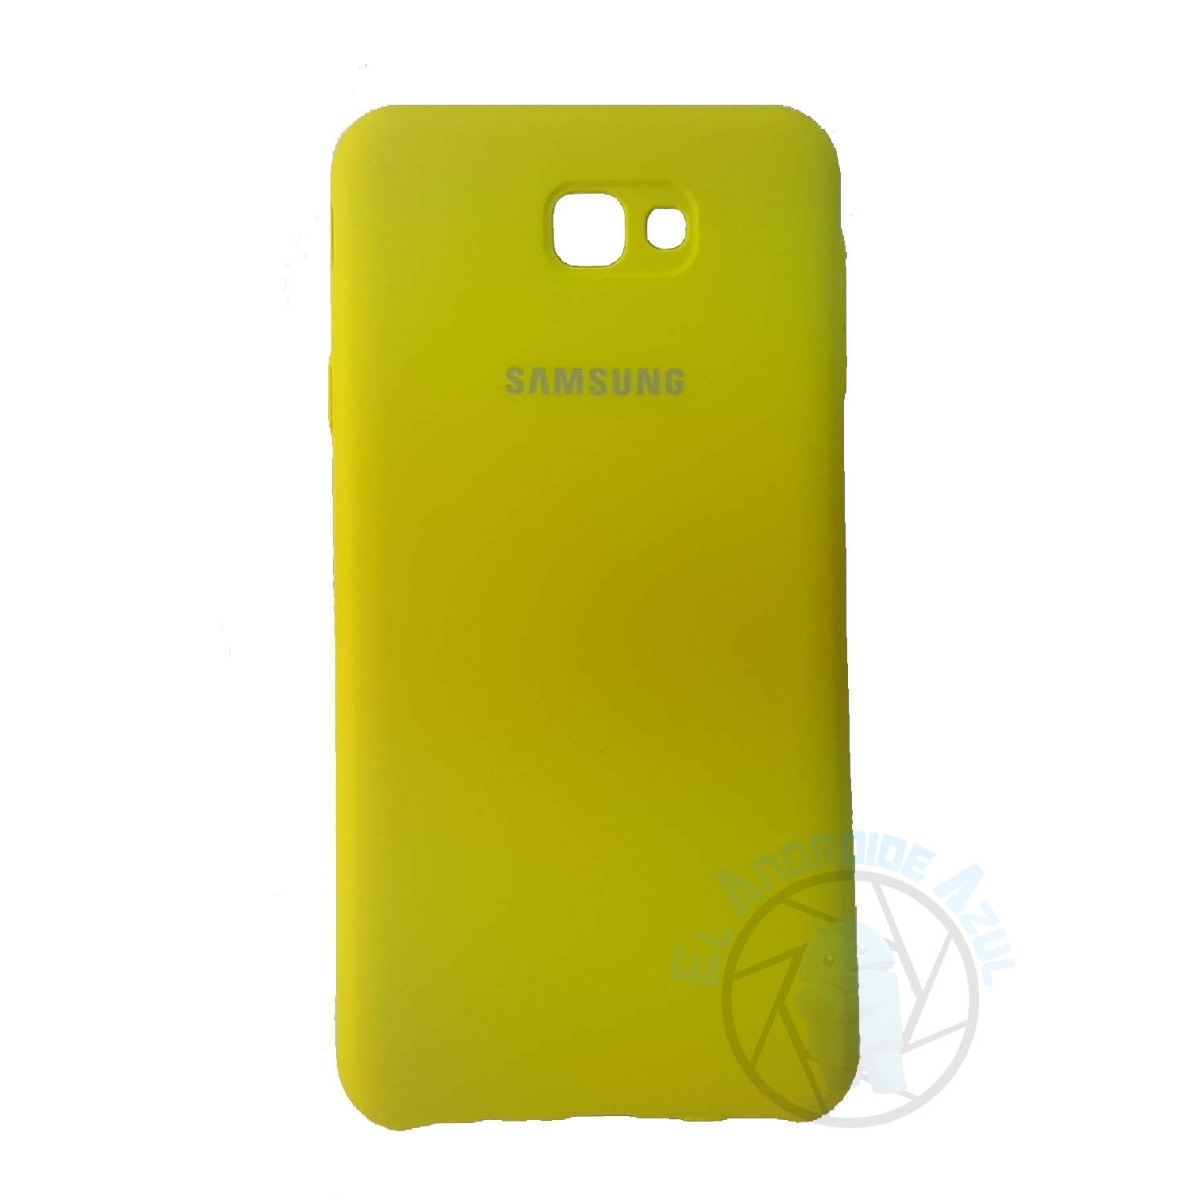 f376e9d4e49 Funda Samsung Original Galaxy J7 Prime Silicone Case - $ 349,00 en ...